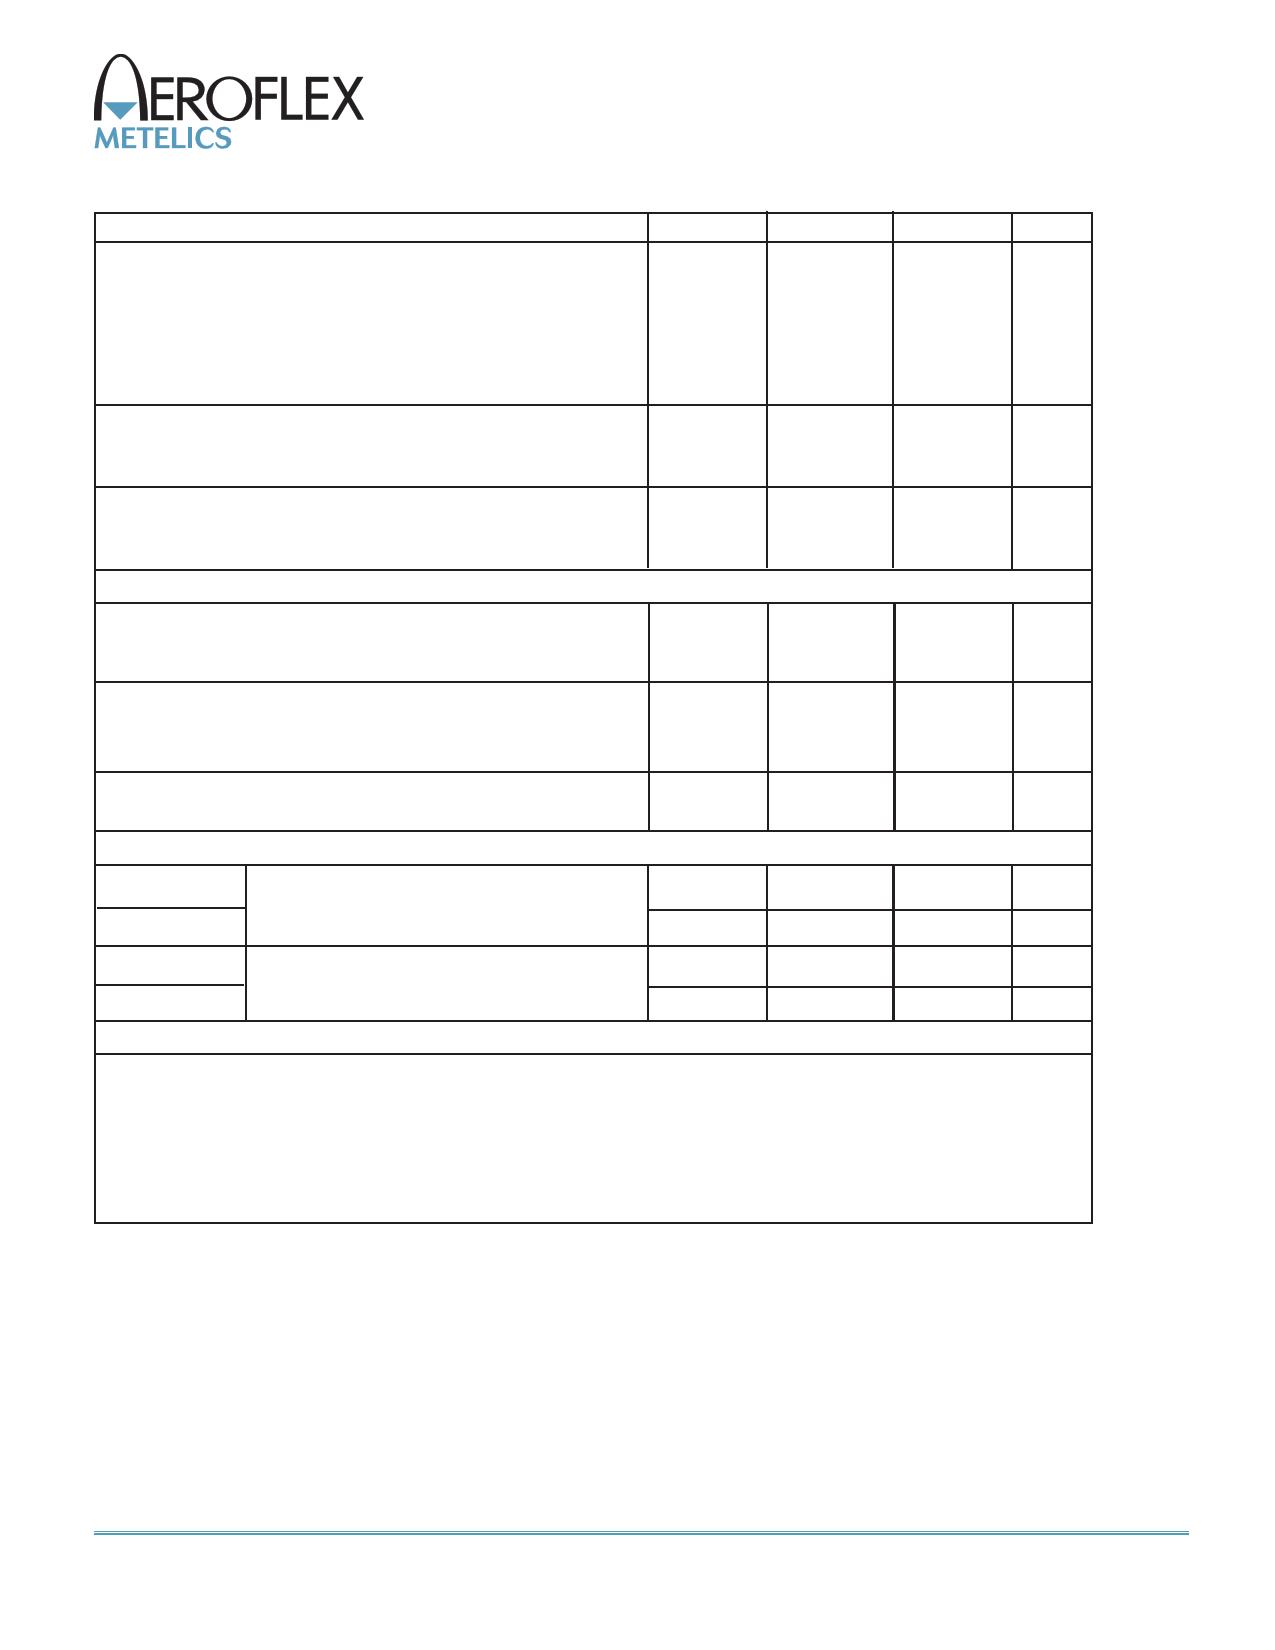 2N5238 pdf, equivalent, schematic